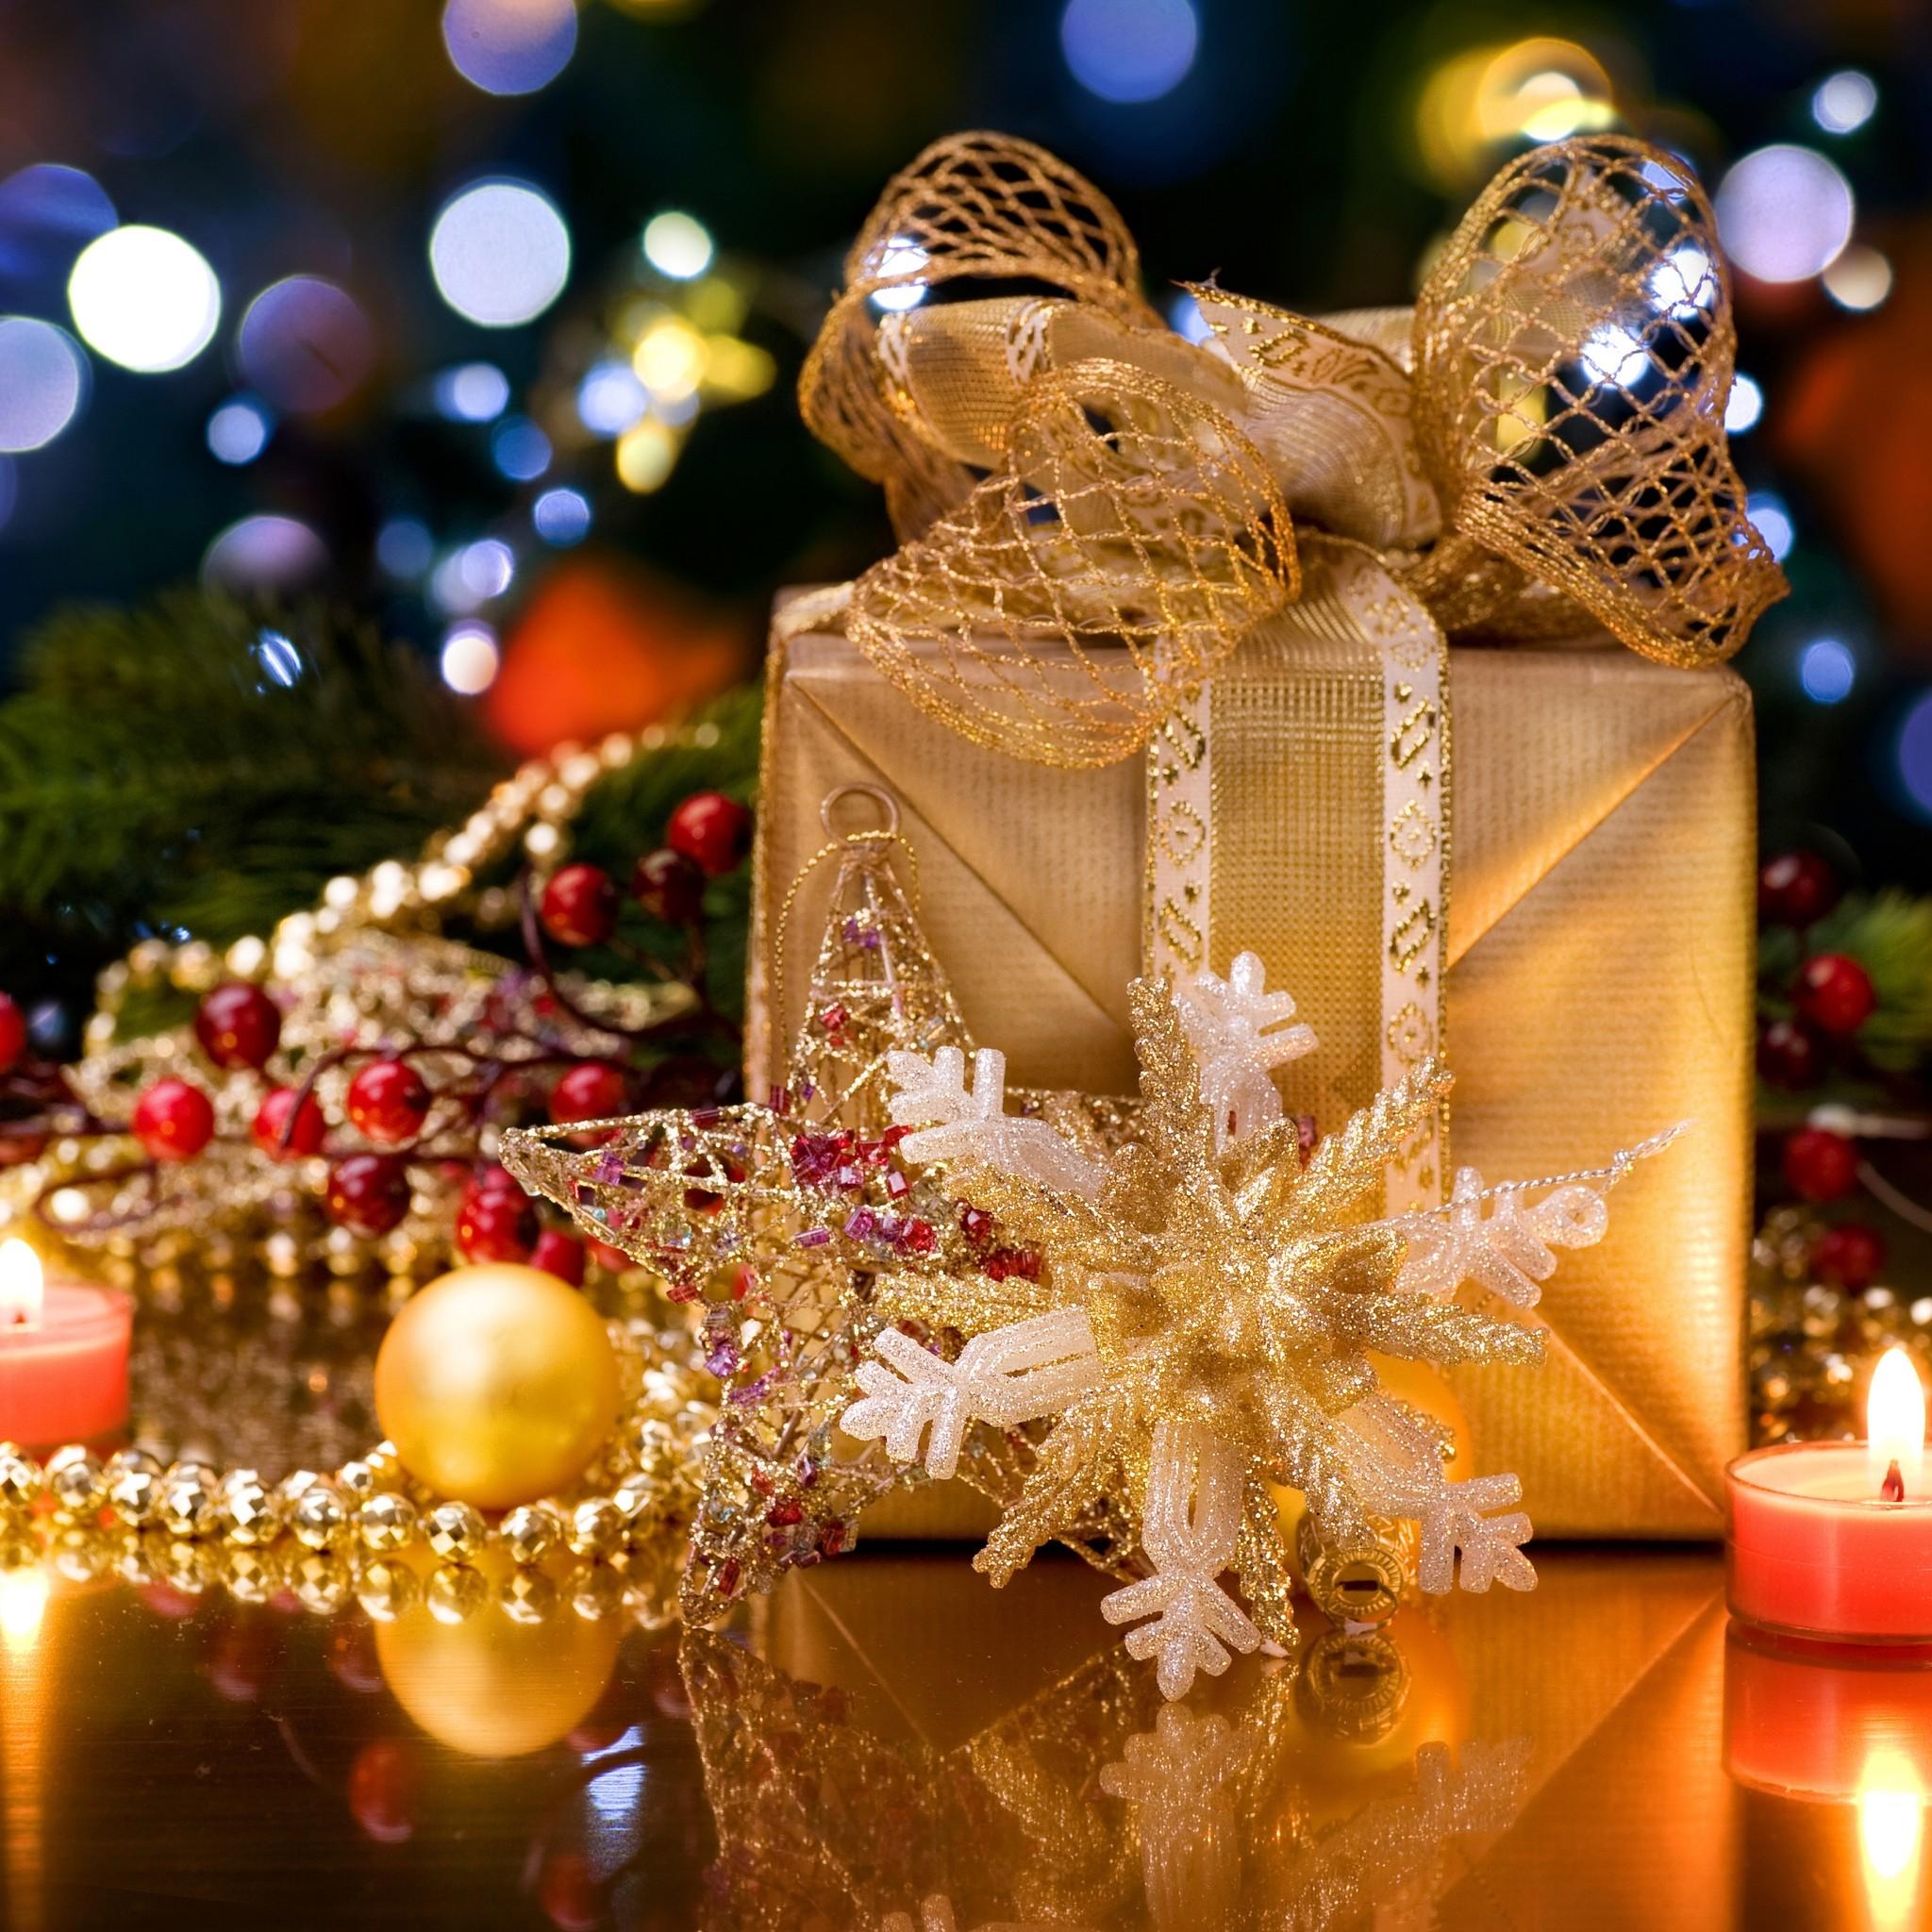 2143 6: Christmas Gift Box iPad wallpaper